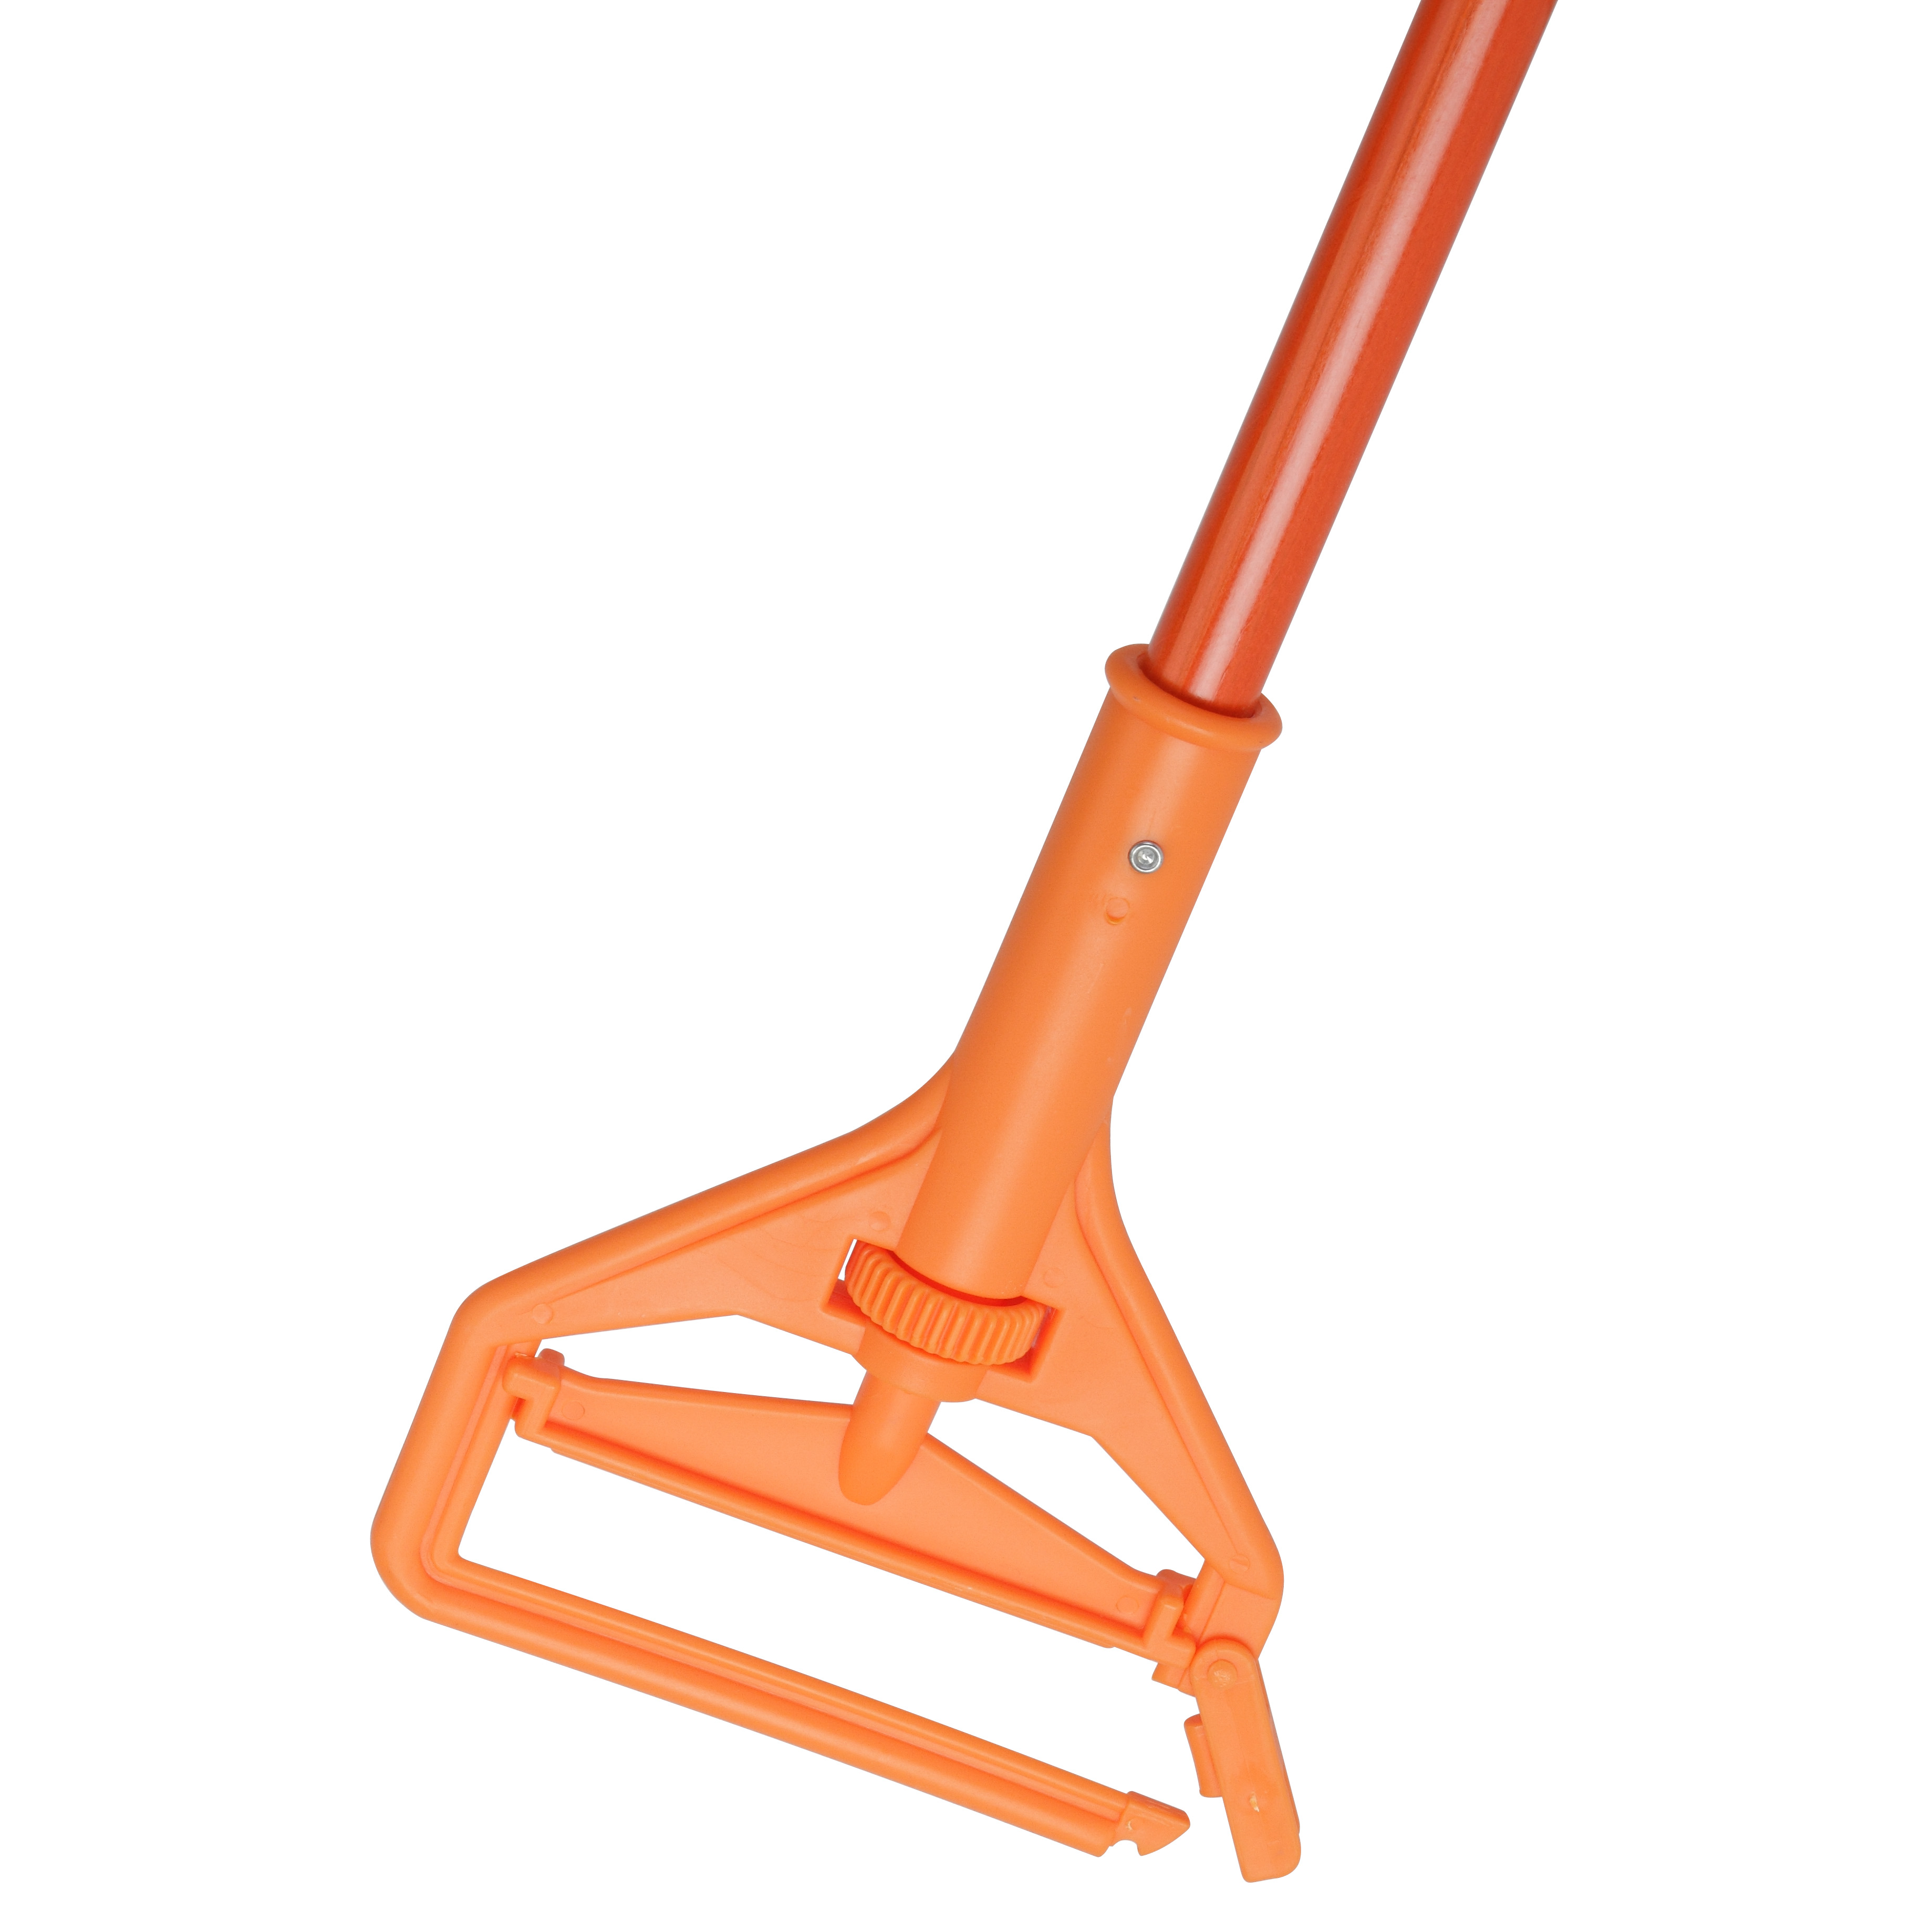 Royal Industries MOP STK SSL FG mop broom handle